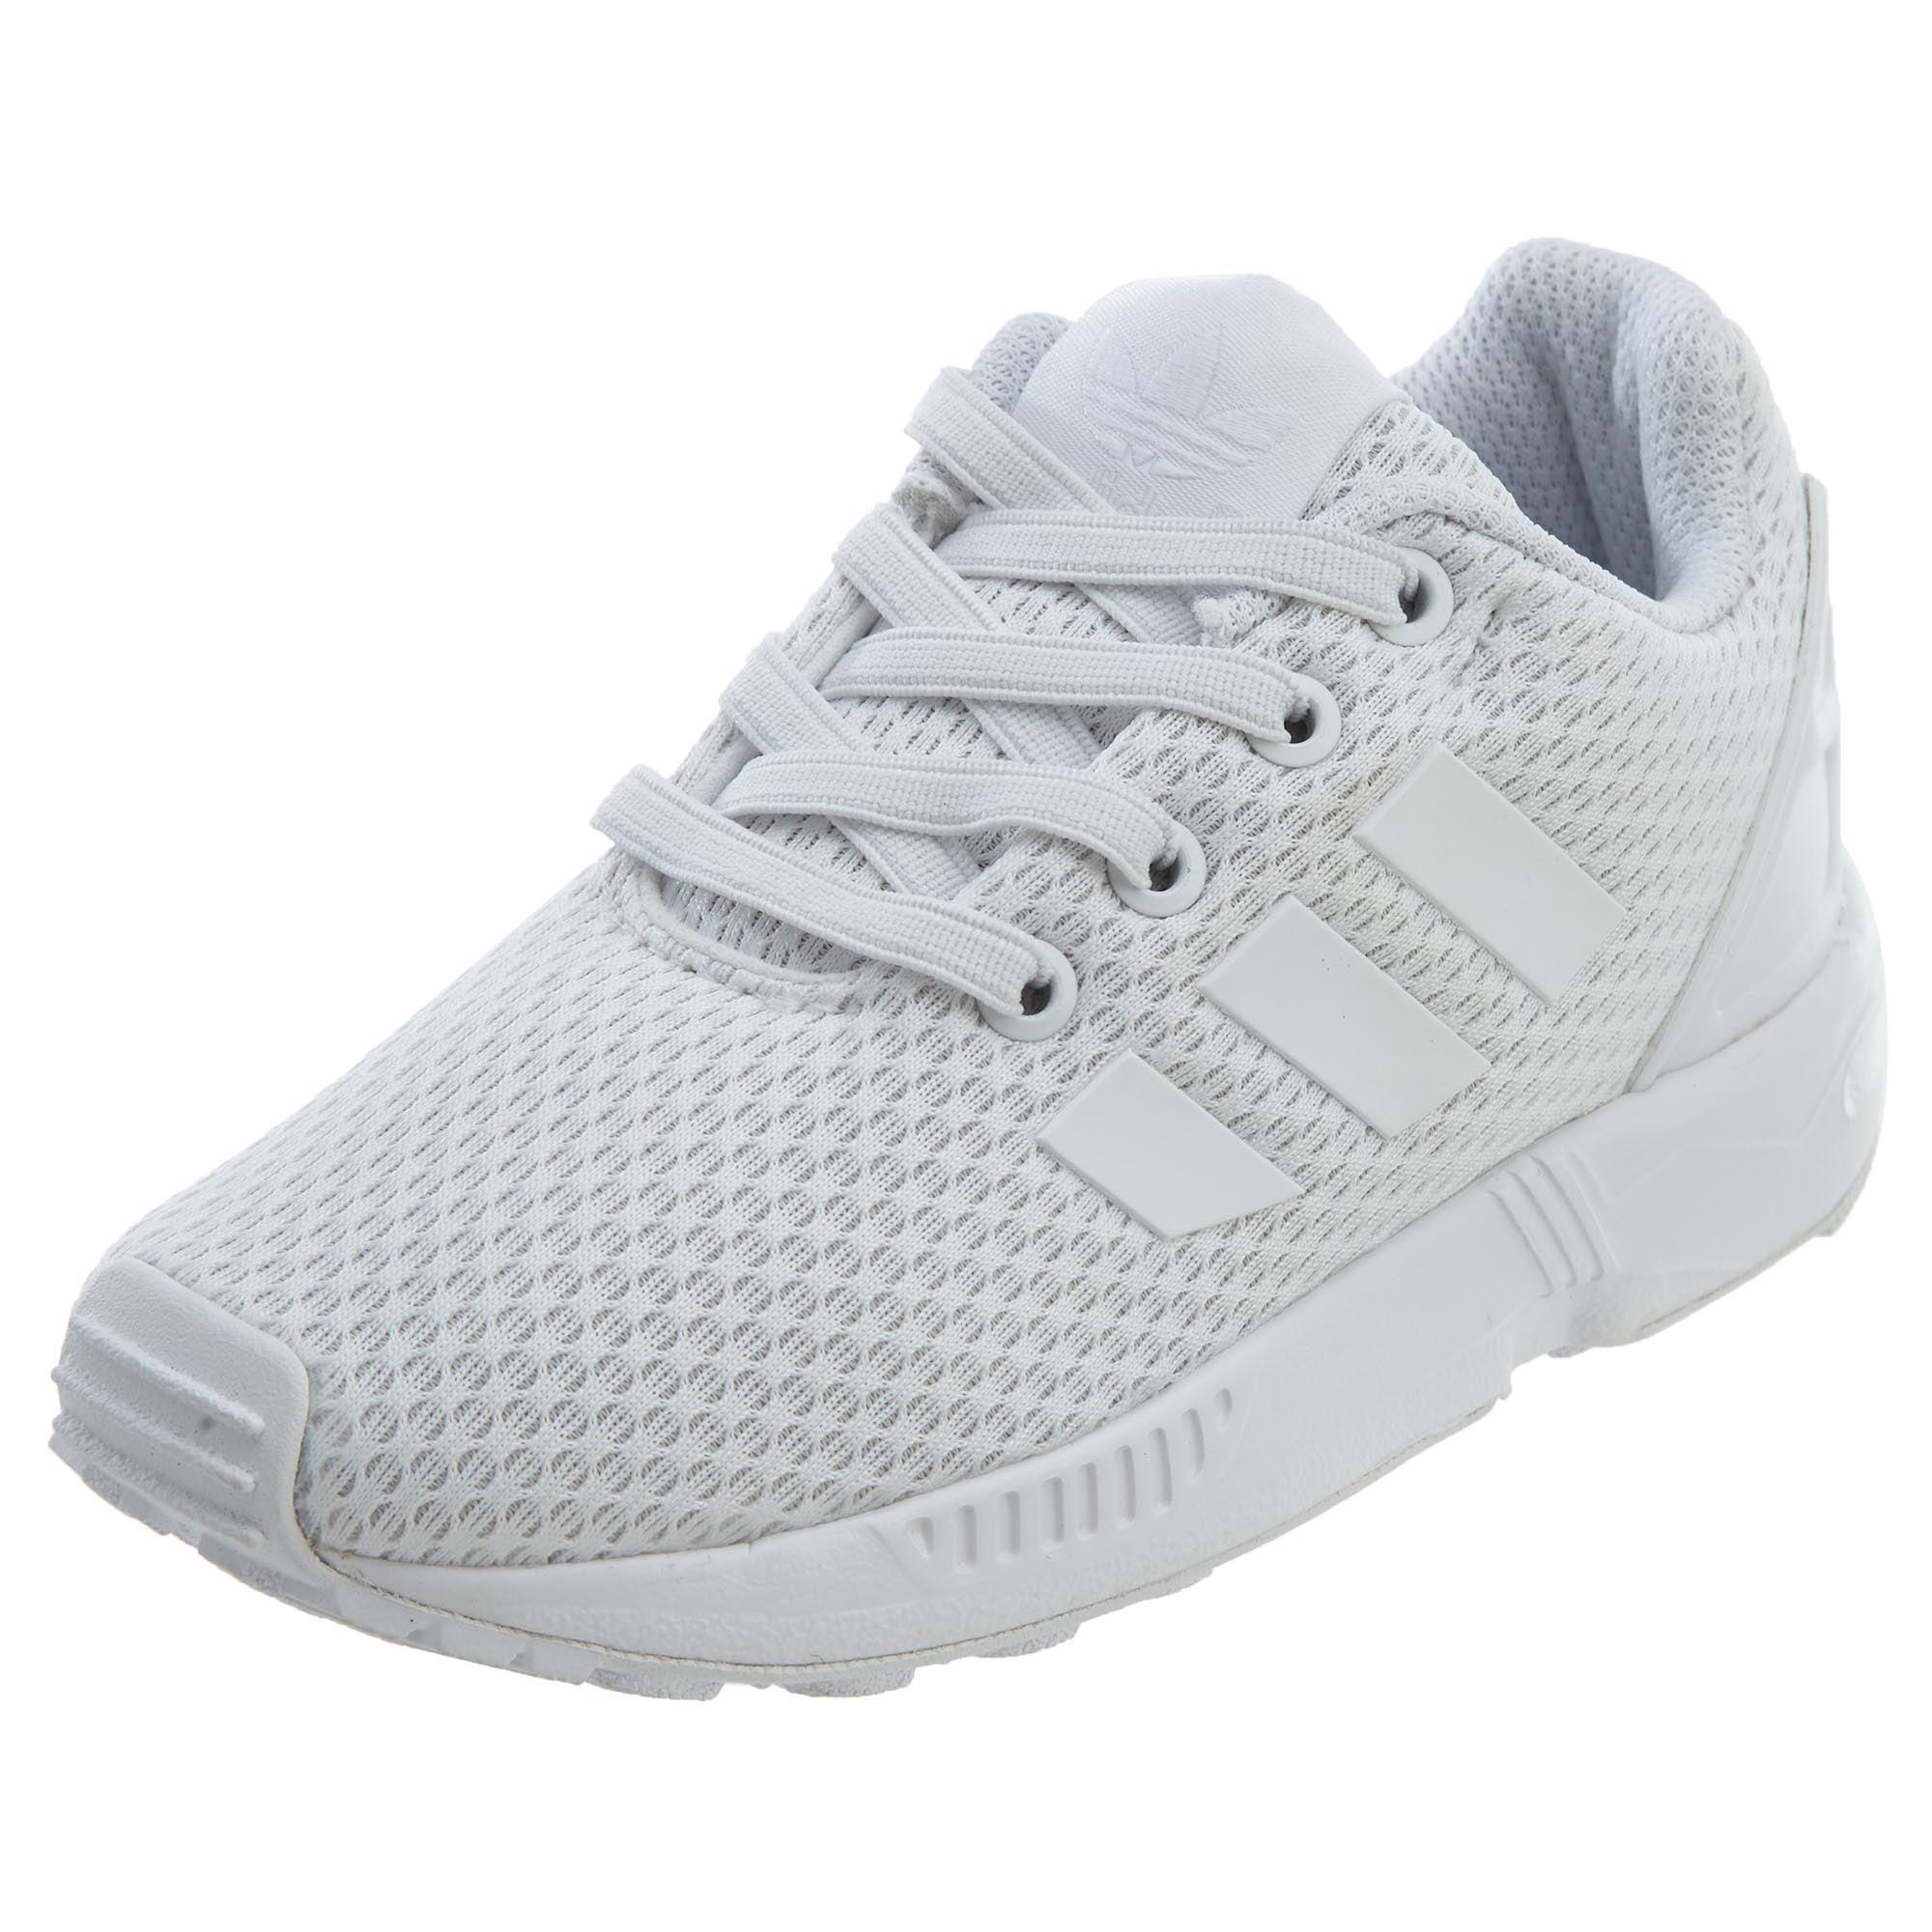 Adidas Zx Flux El I Scarpe Sneaker Bambino BB2434-CBLACK//CBLACK//FTWWHT